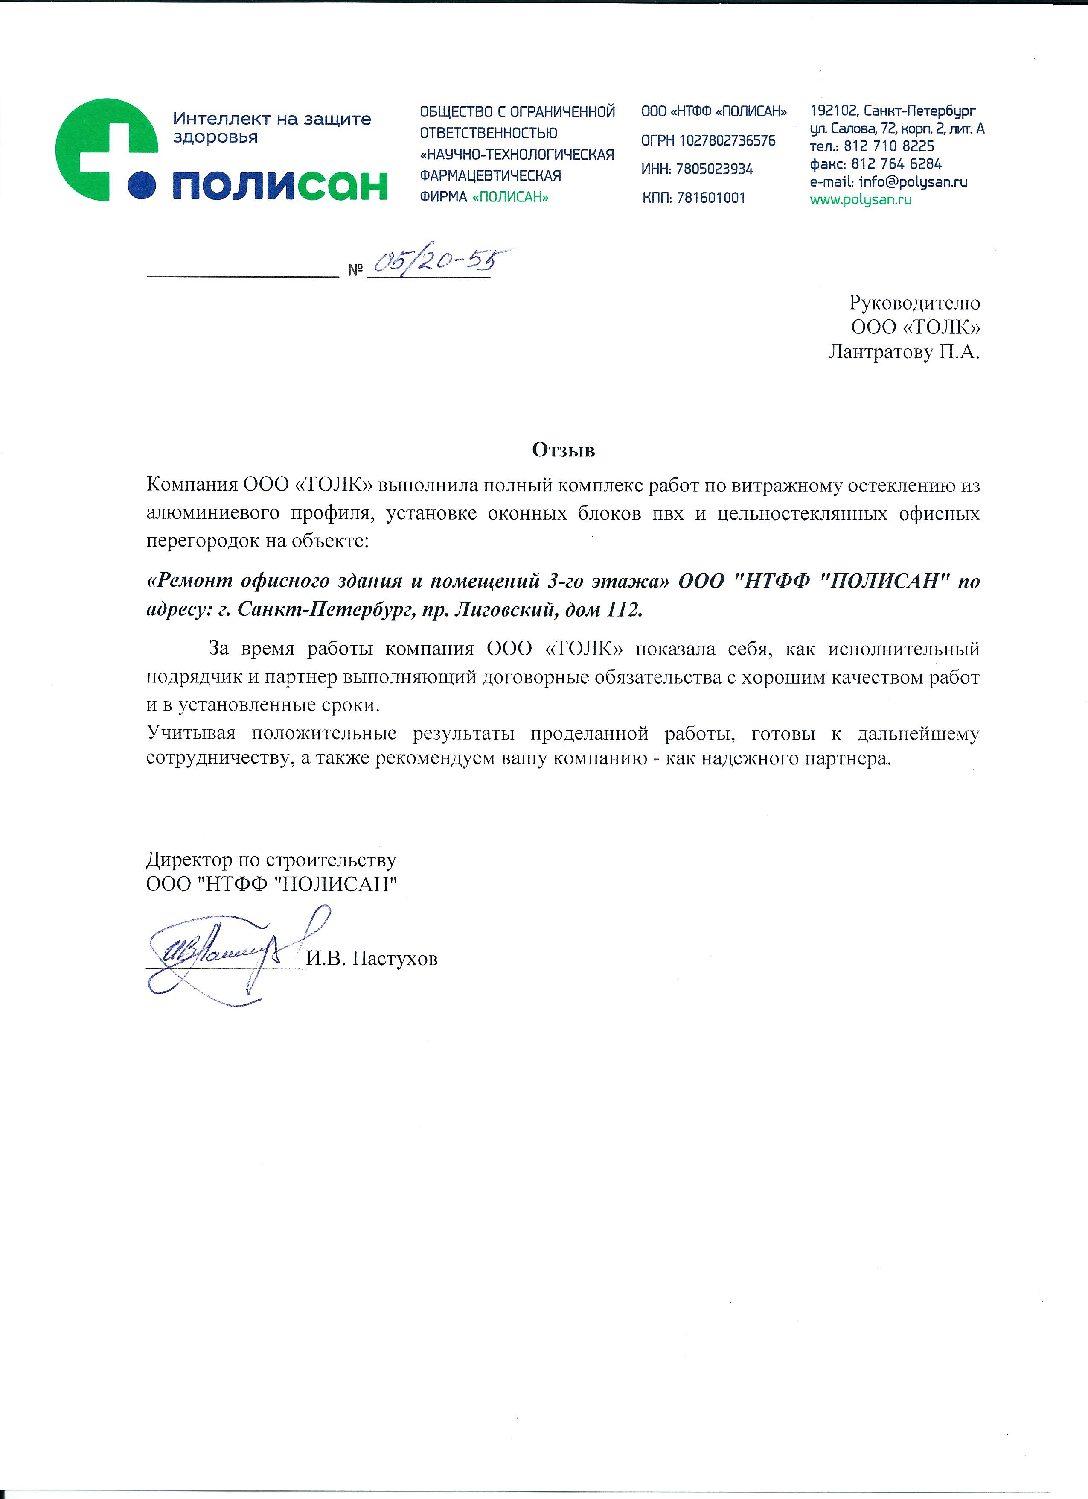 ООО НТФФ ПОЛИСАН, офис на Лиговском пр. 112.